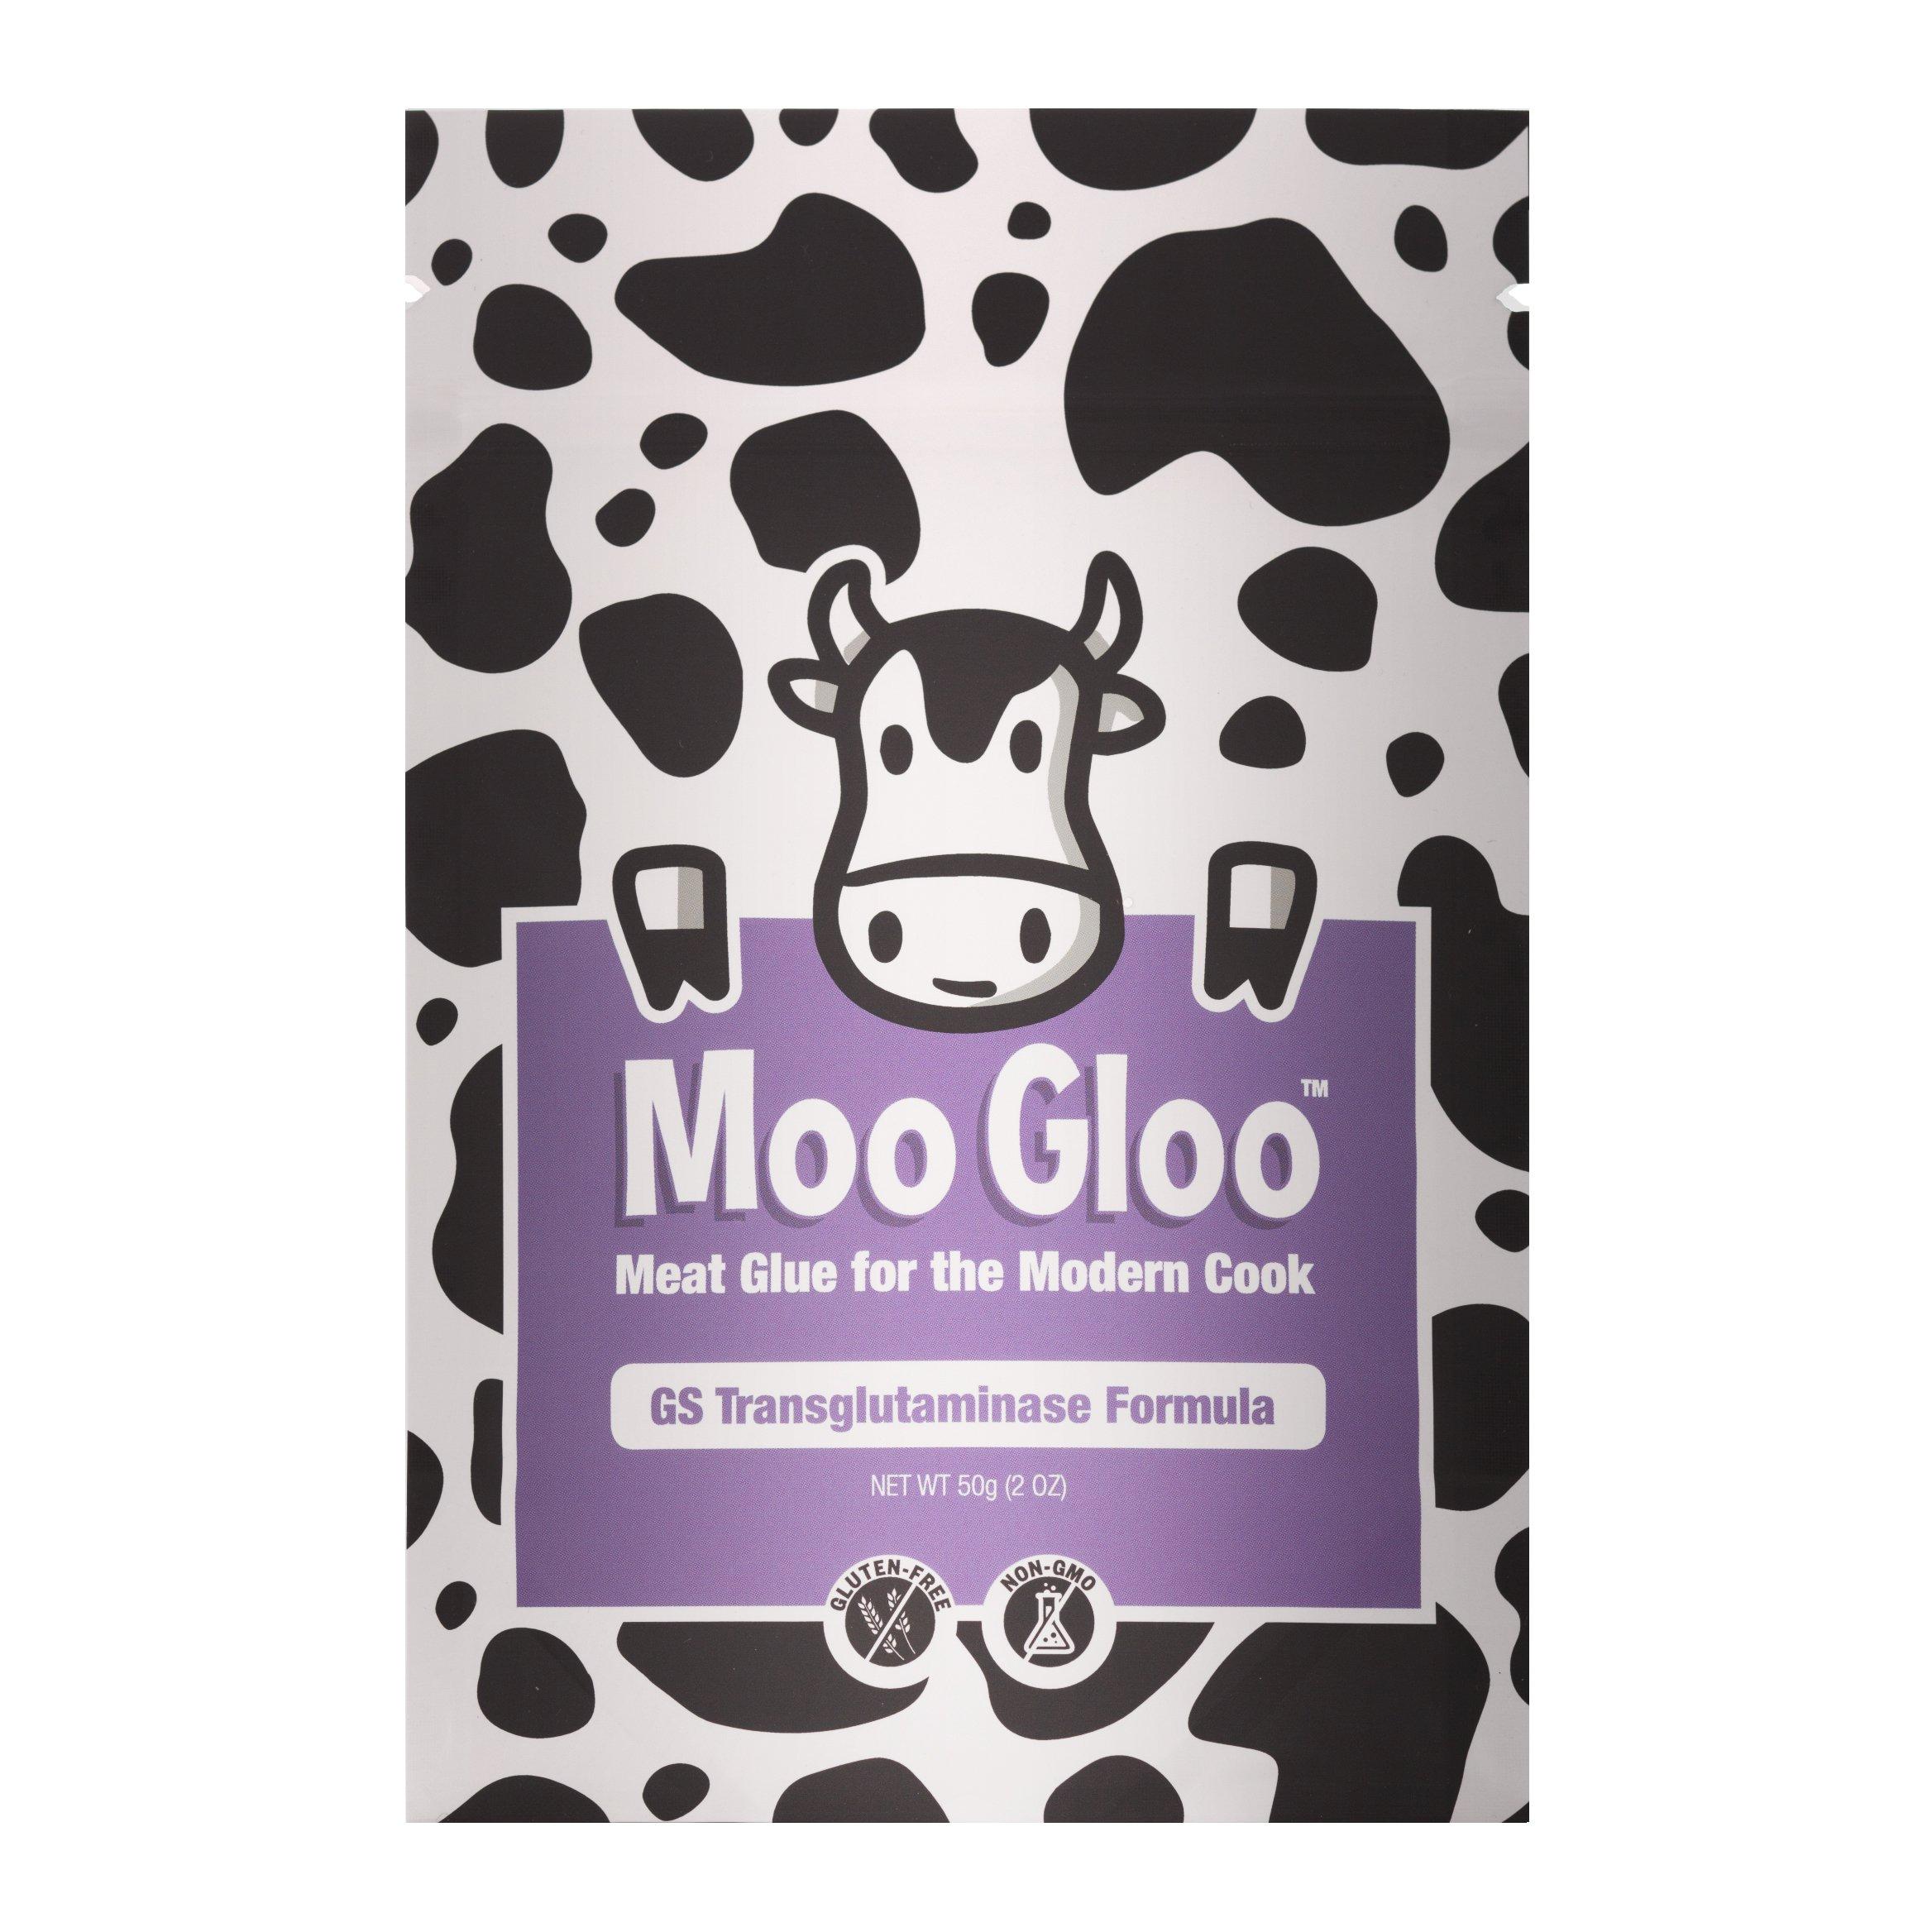 Moo Gloo Value Pack - Transglutaminase - Meat Glue - 150g/6oz. (Bundle with 3 items) by Moo Gloo (Image #3)